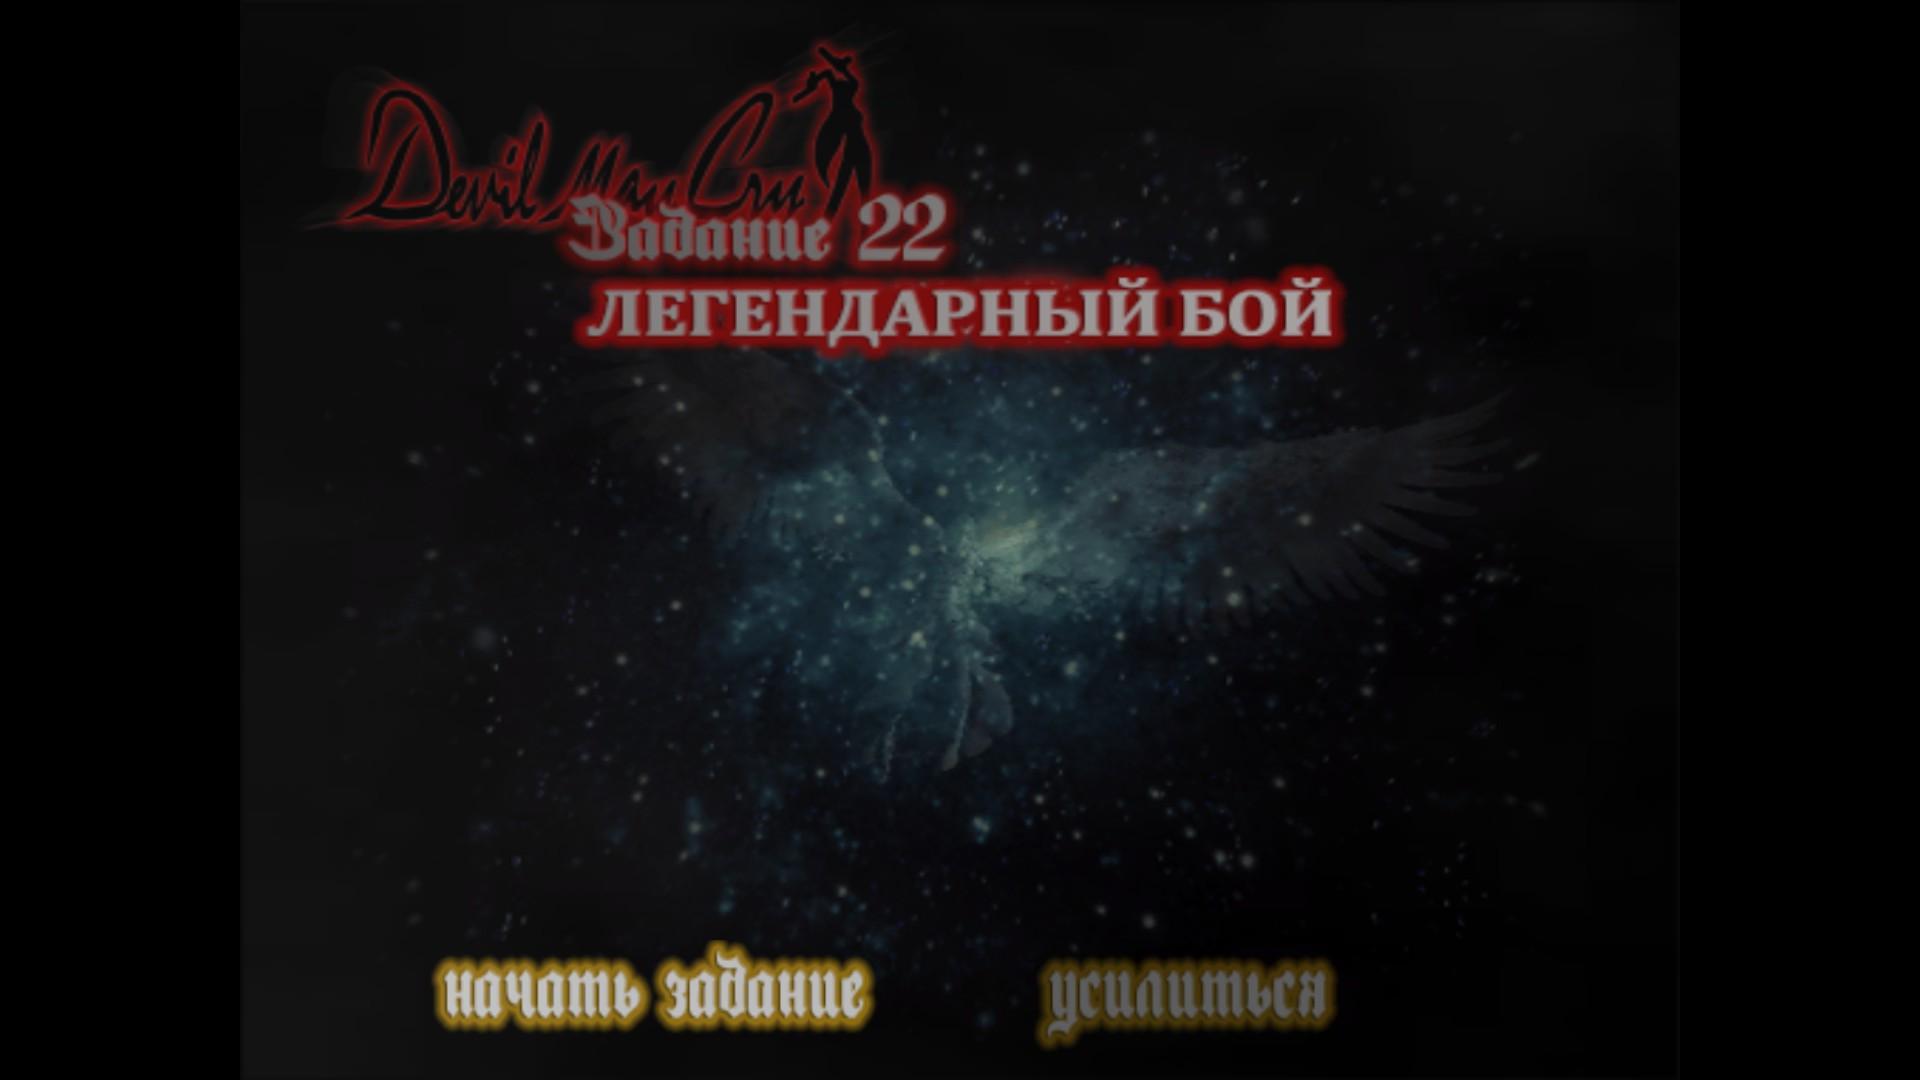 F2SOUKtuUc8.jpg